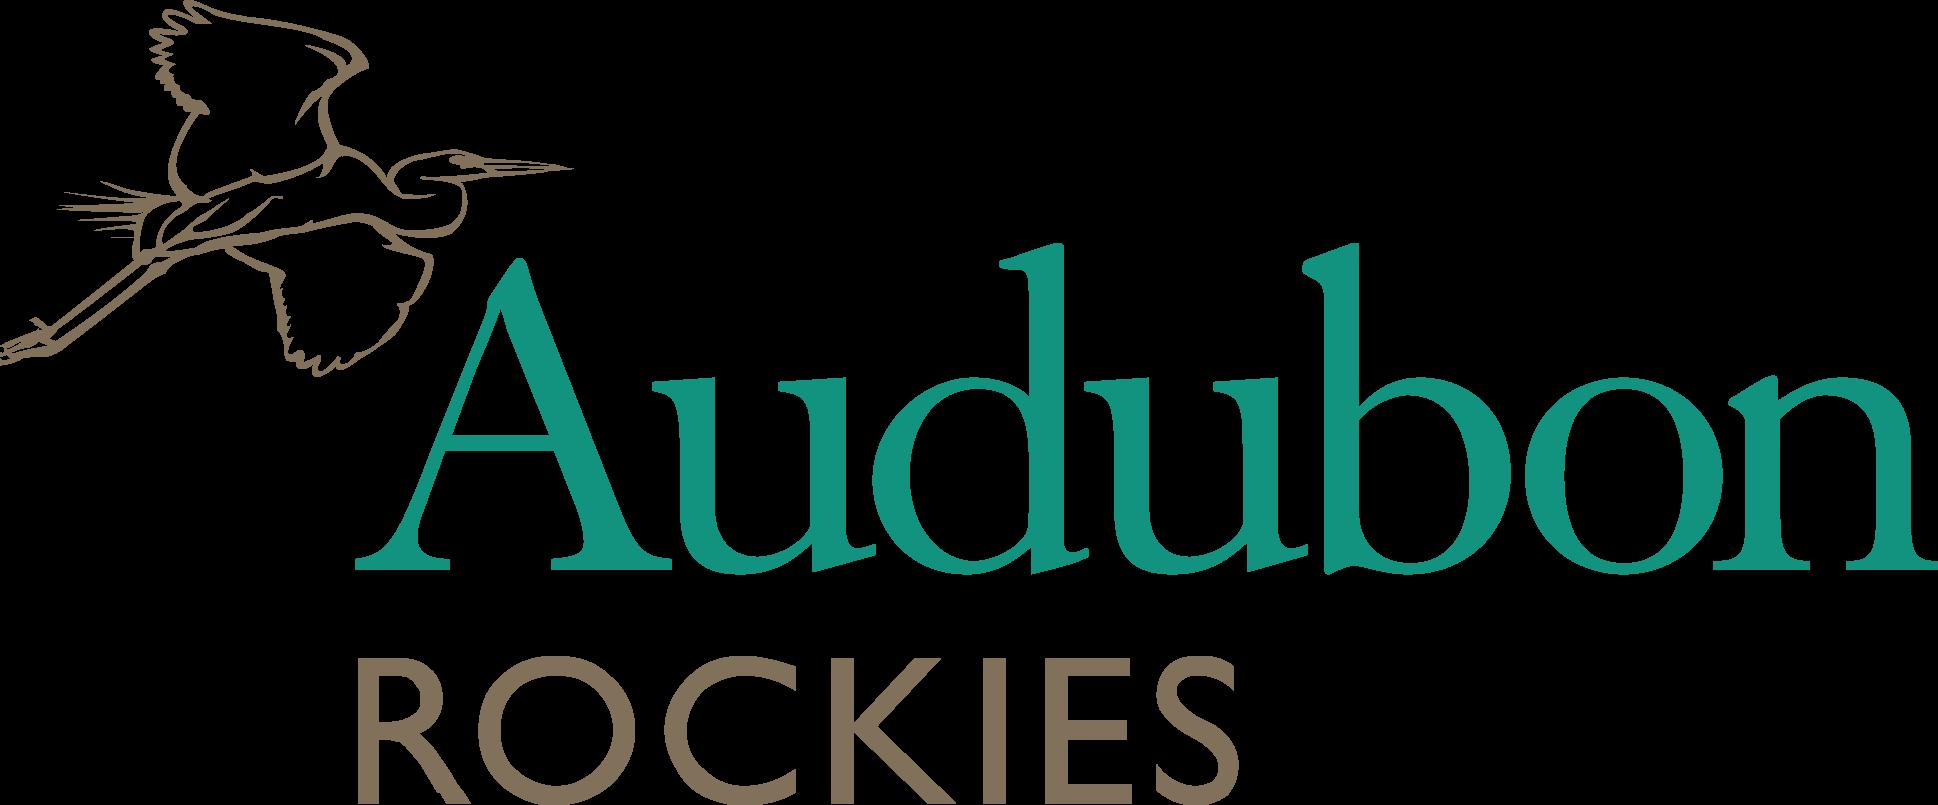 Audubon Rockies Logo